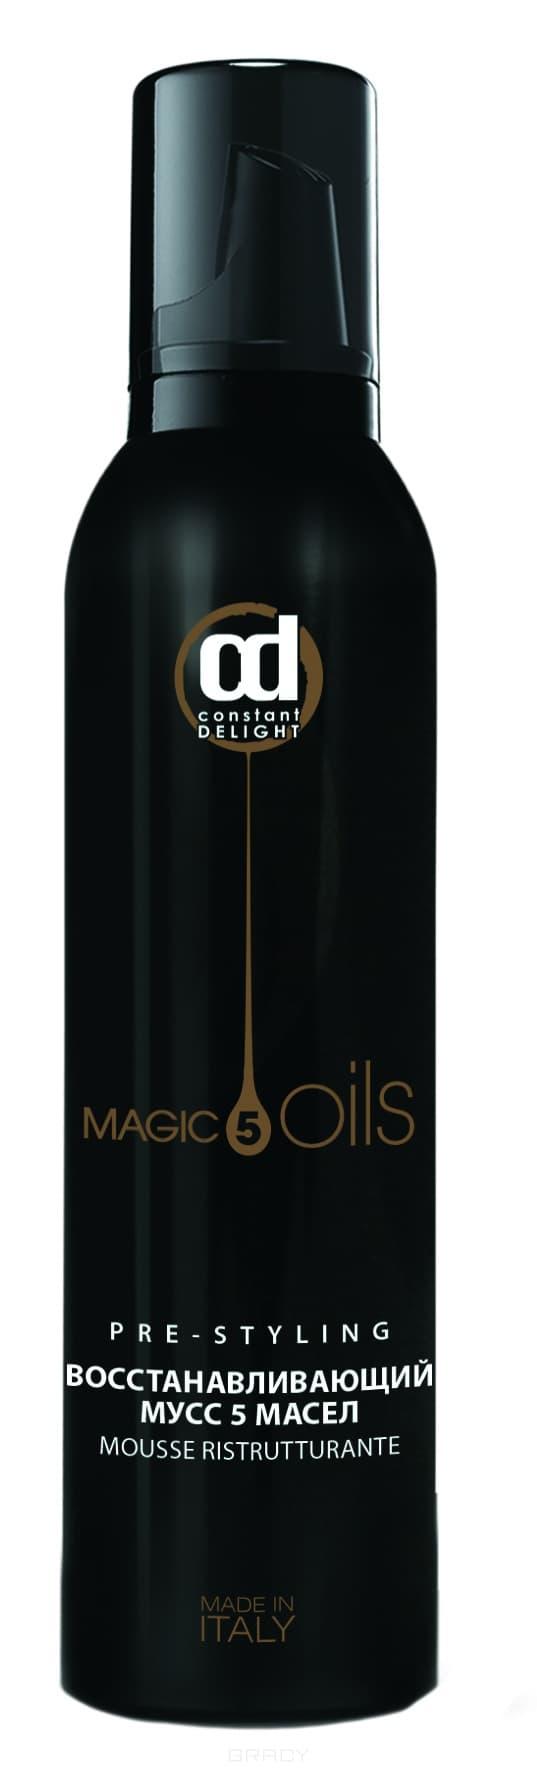 Constant Delight Восстанавливающий мусс 5 Magic Oil, 250 мл, Восстанавливающий мусс 5 Magic Oil, 250 мл, 250 мл соусник 5 5 20 5 см 250 мл белый шиповник 1134219